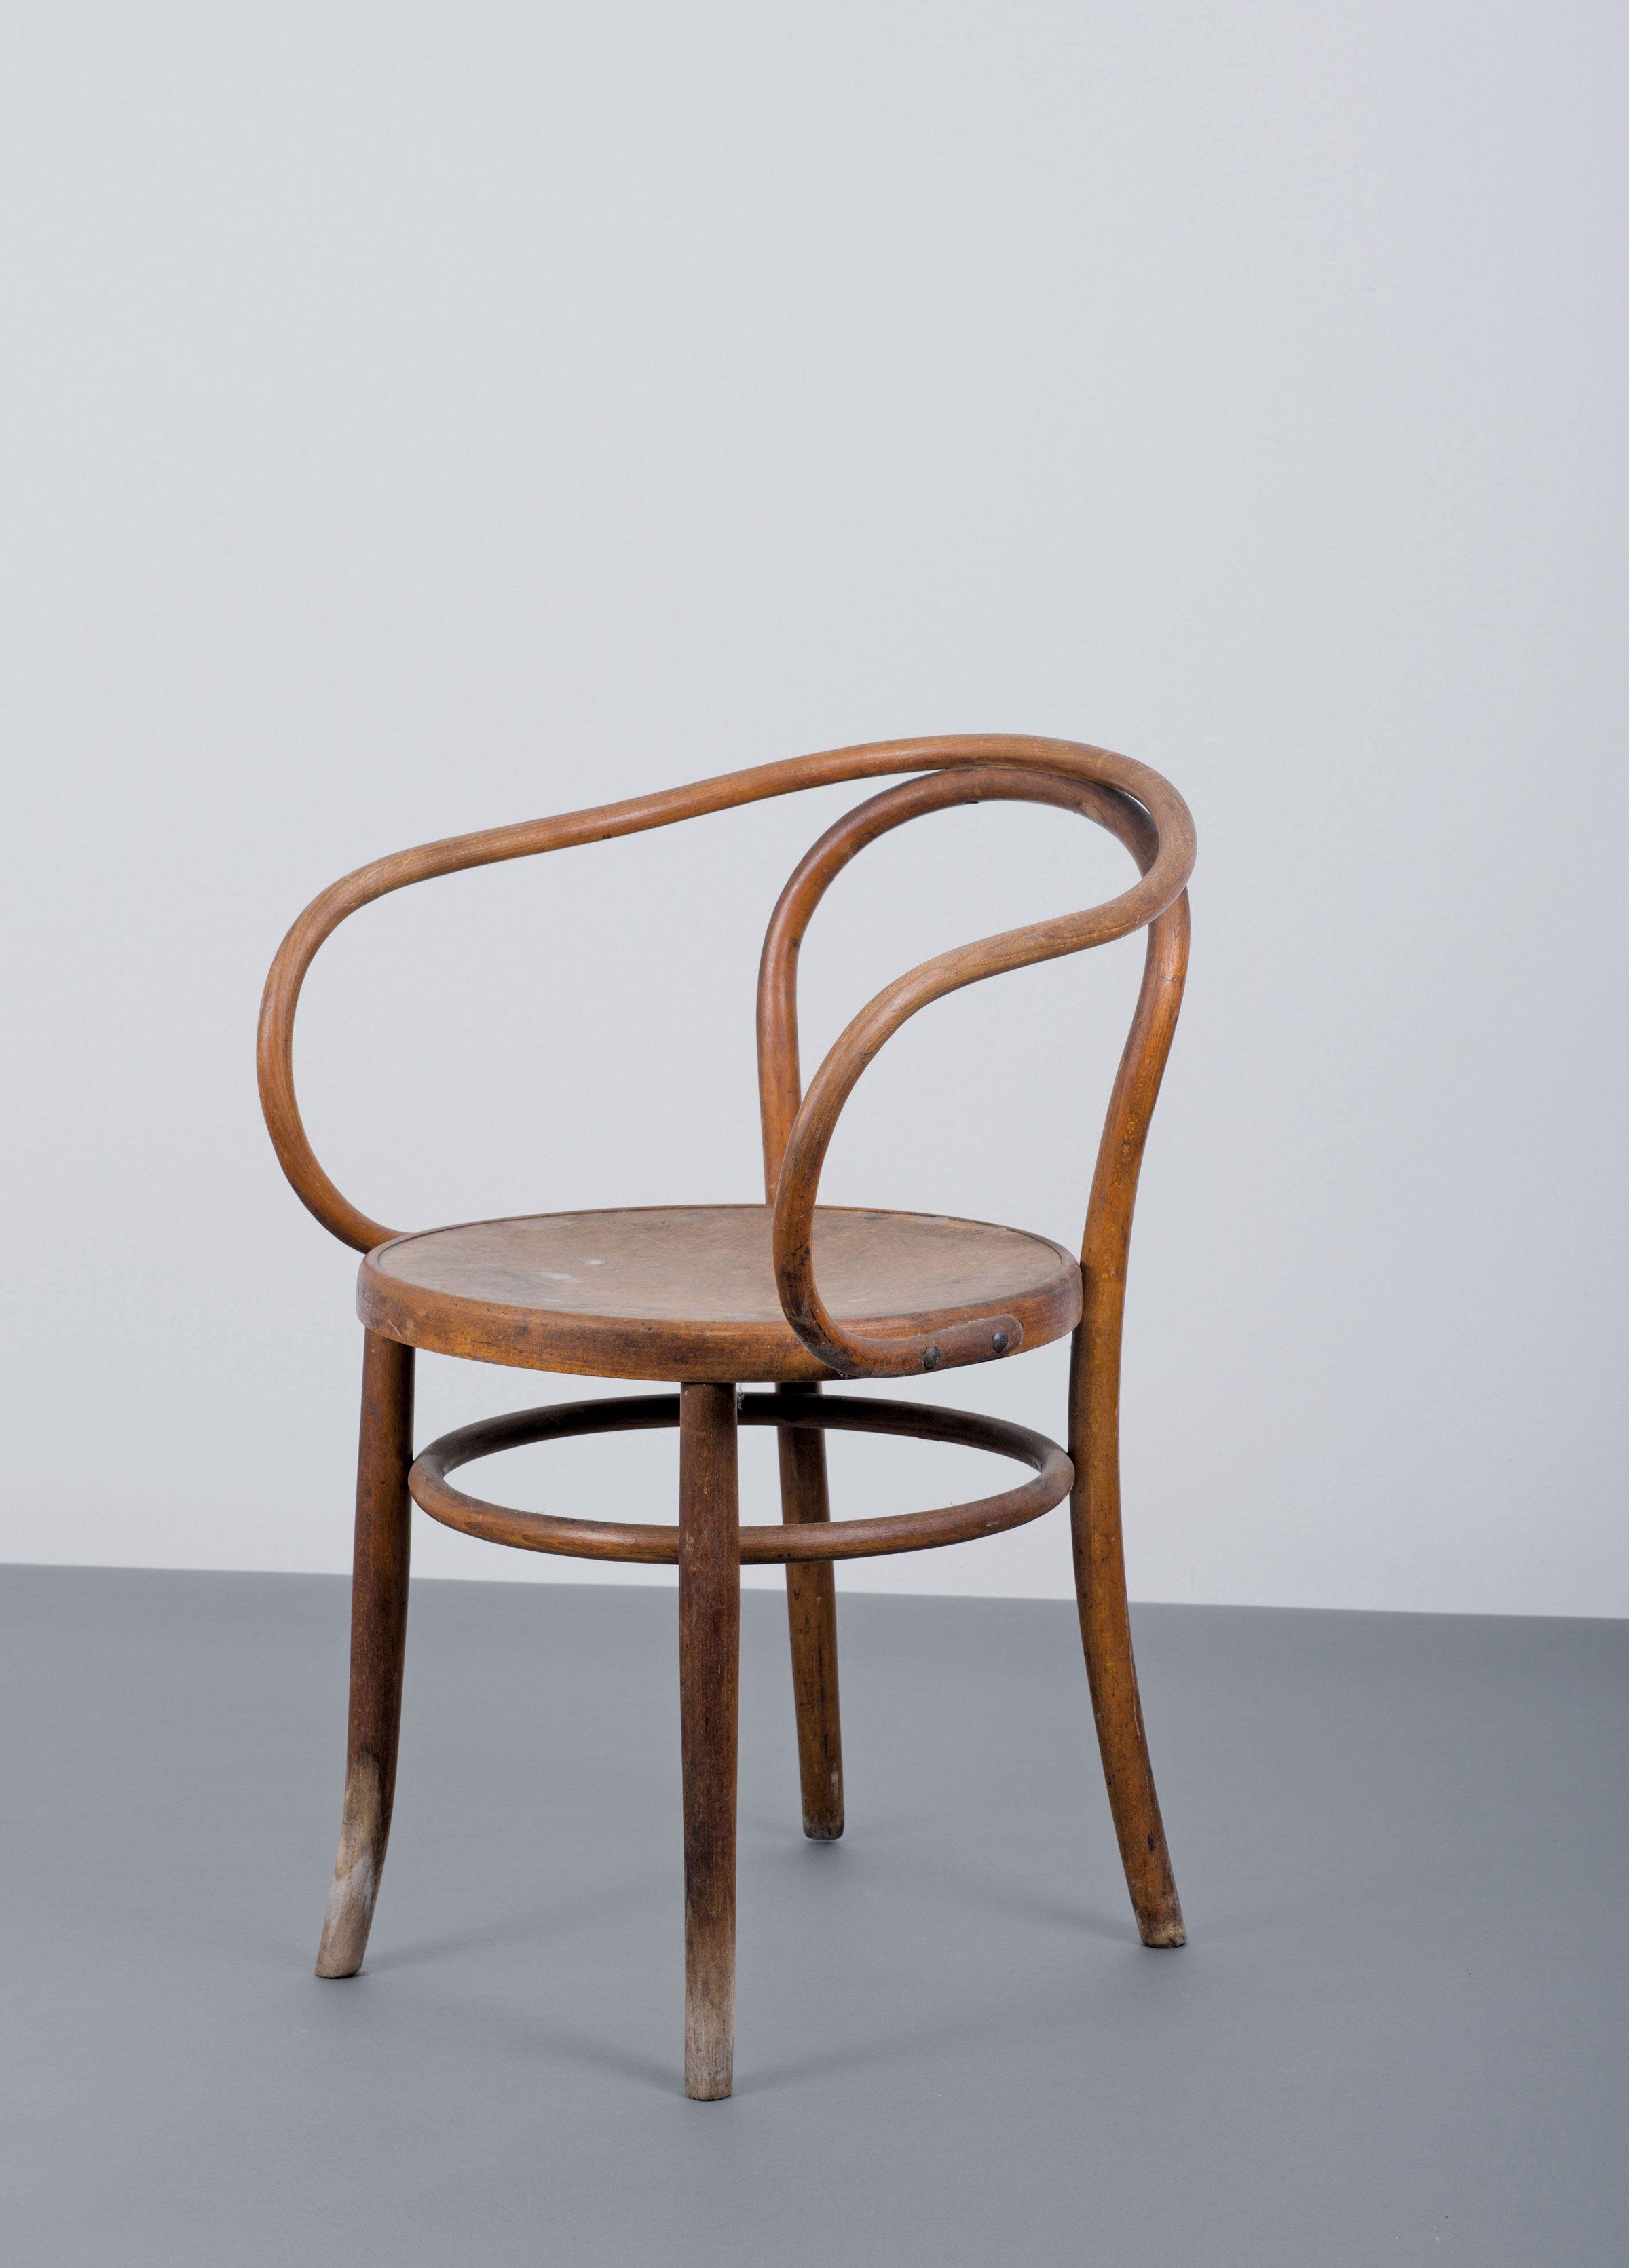 Chair Design Inspiration Retro Chairs For Sale Reform Kitchen Interior